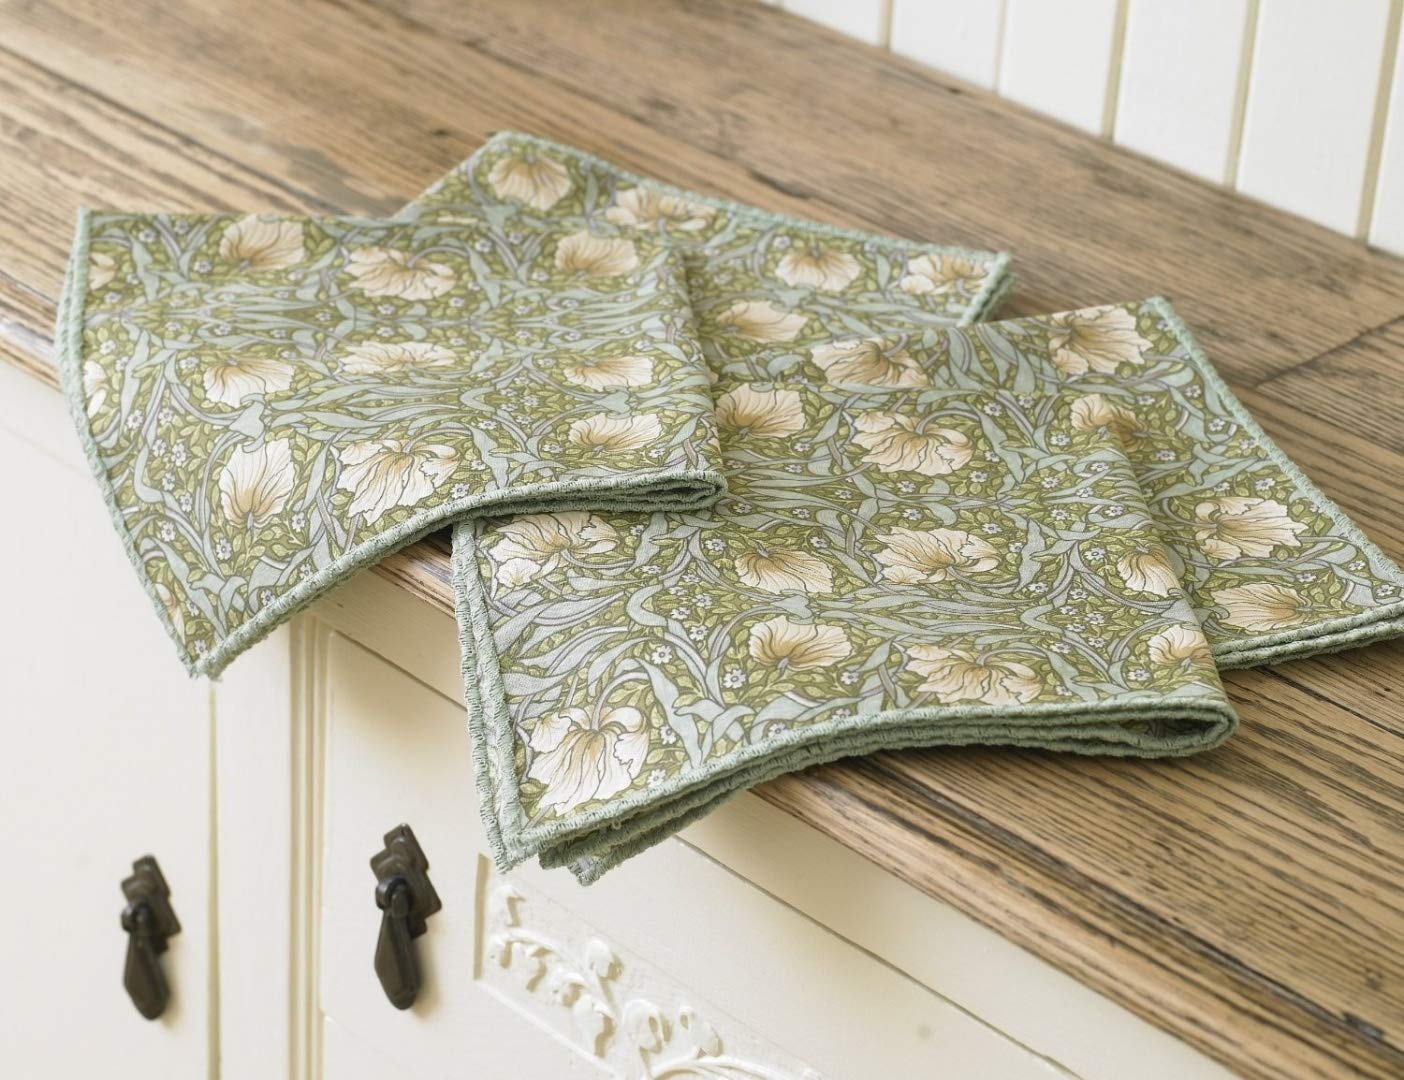 Licensed William Morris Pimpernel Green Floral 100% Cotton Napkins / Serviettes Laura's Beau Ltd